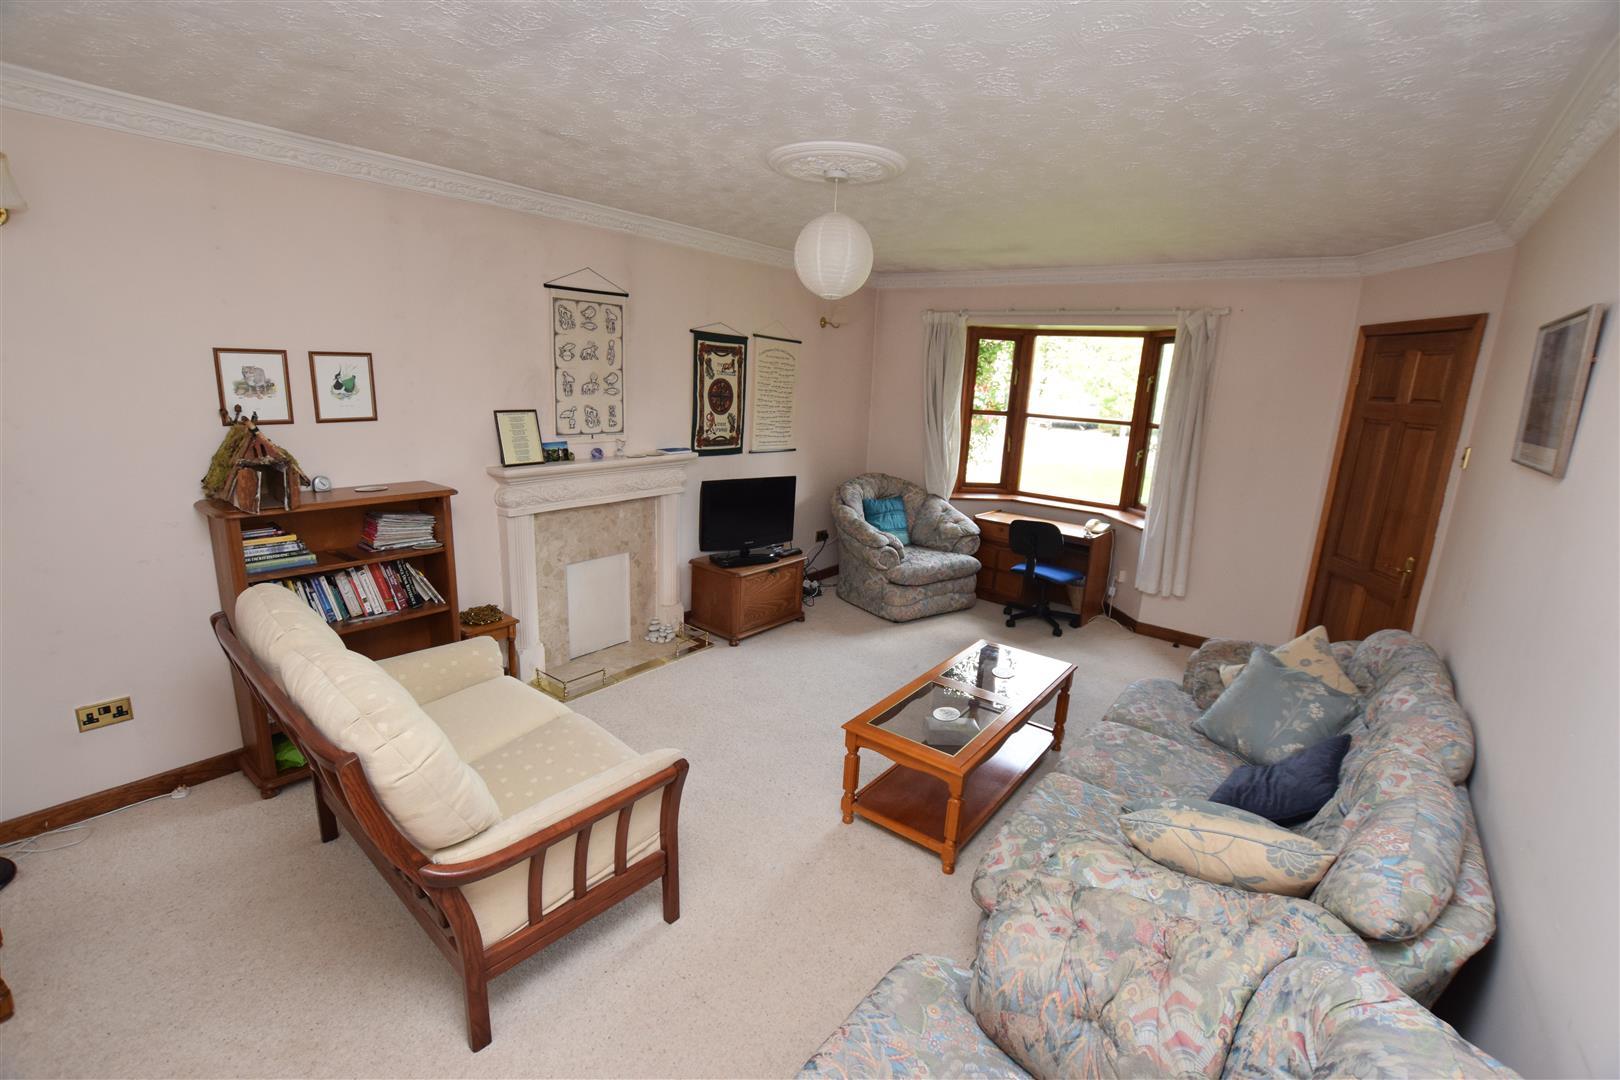 25, Glenorchil Crescent, Auchterarder, Perthshire, PH3 1PY, UK